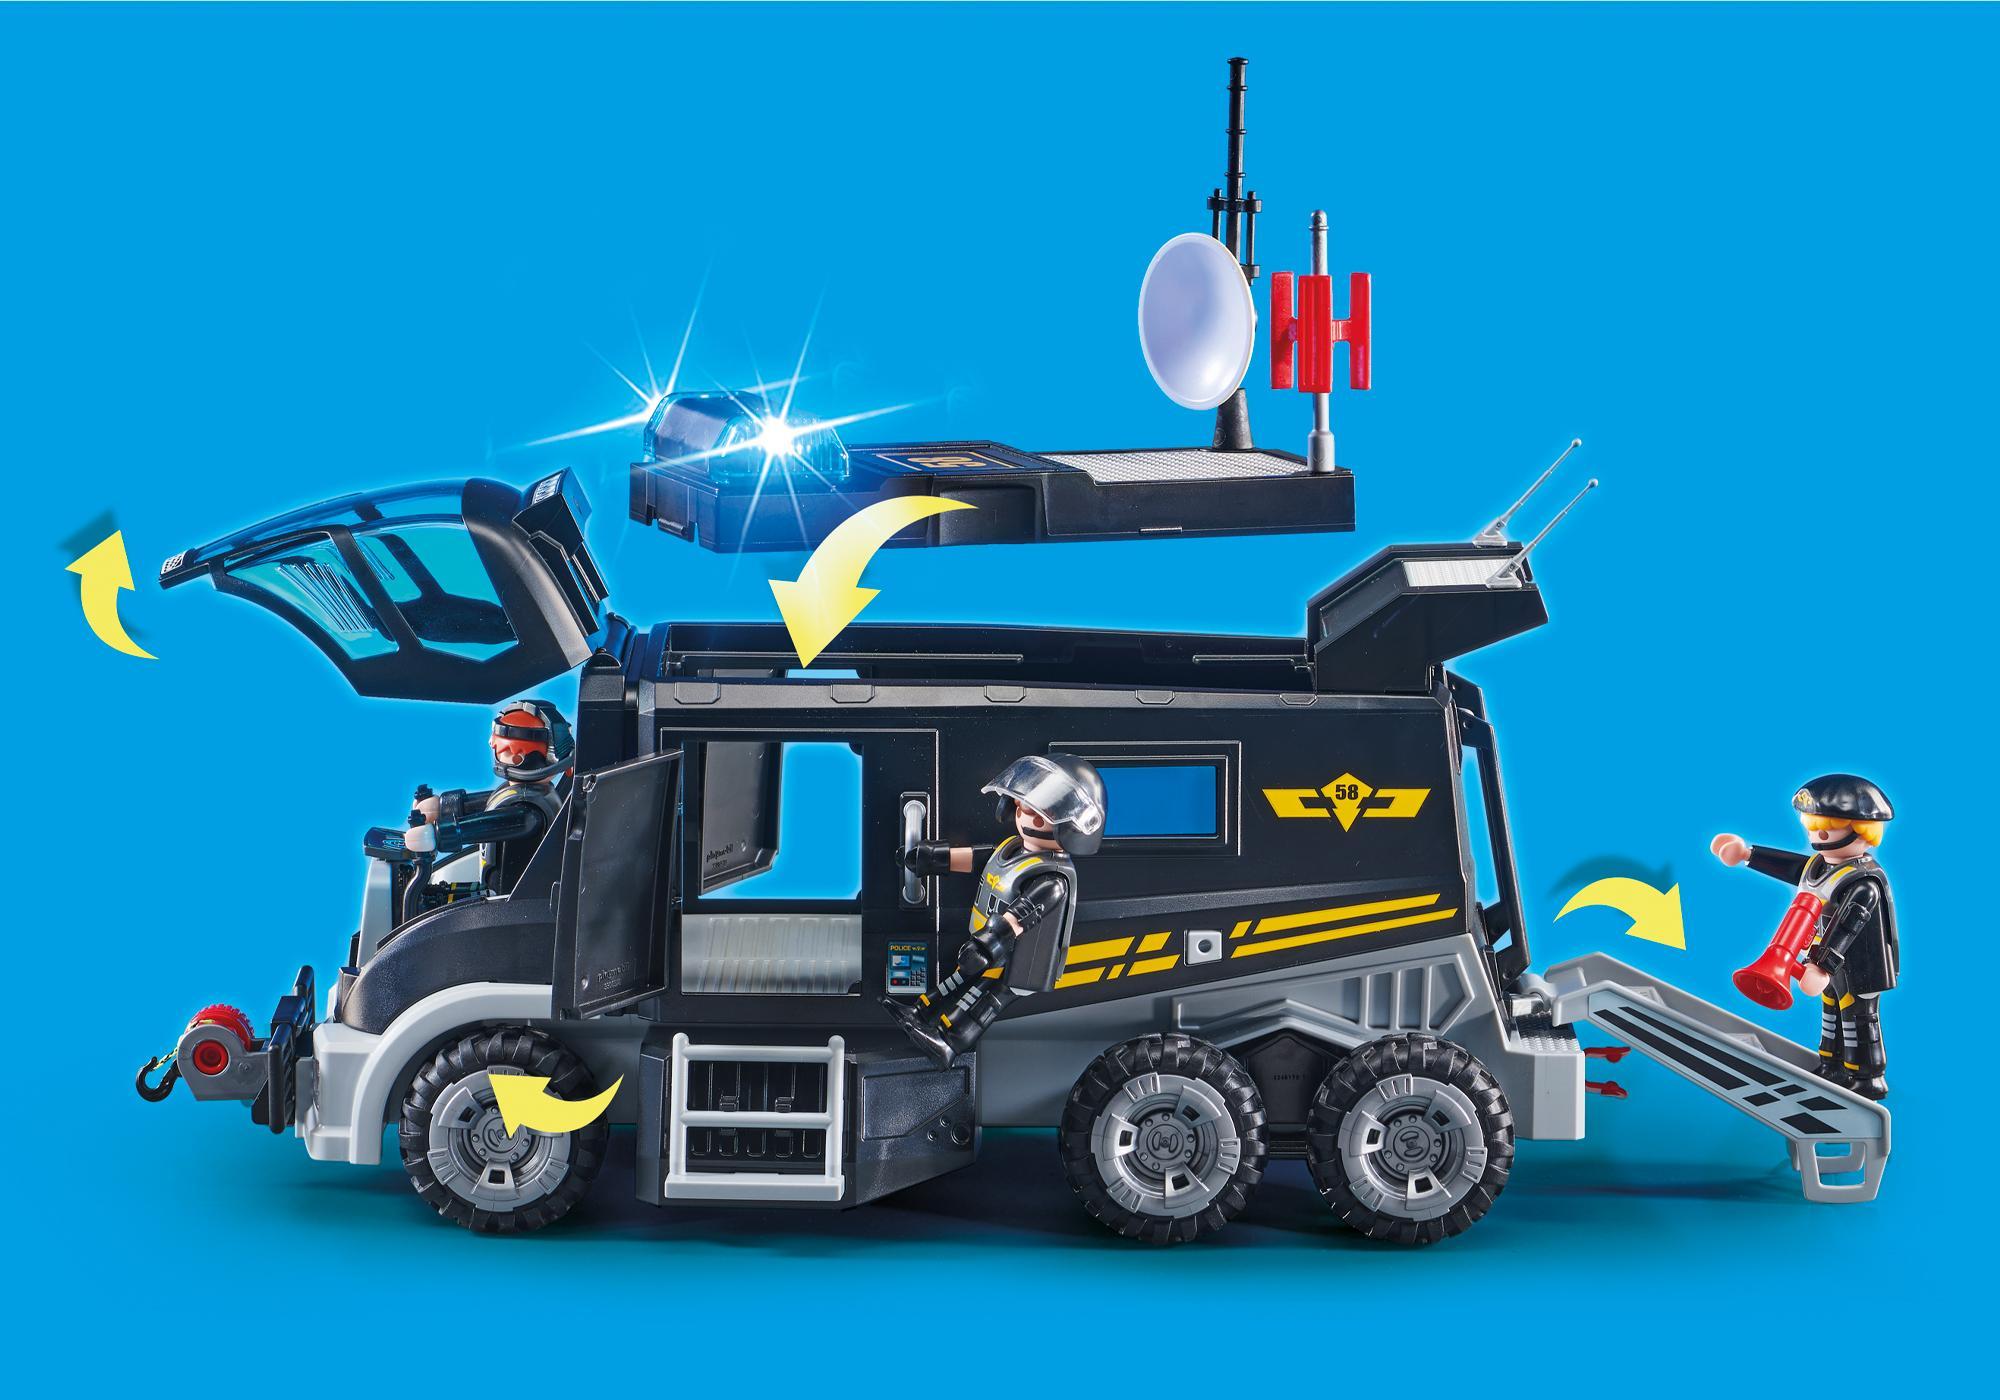 http://media.playmobil.com/i/playmobil/9360_product_extra3/Vehículo con luz LED y módulo de sonido